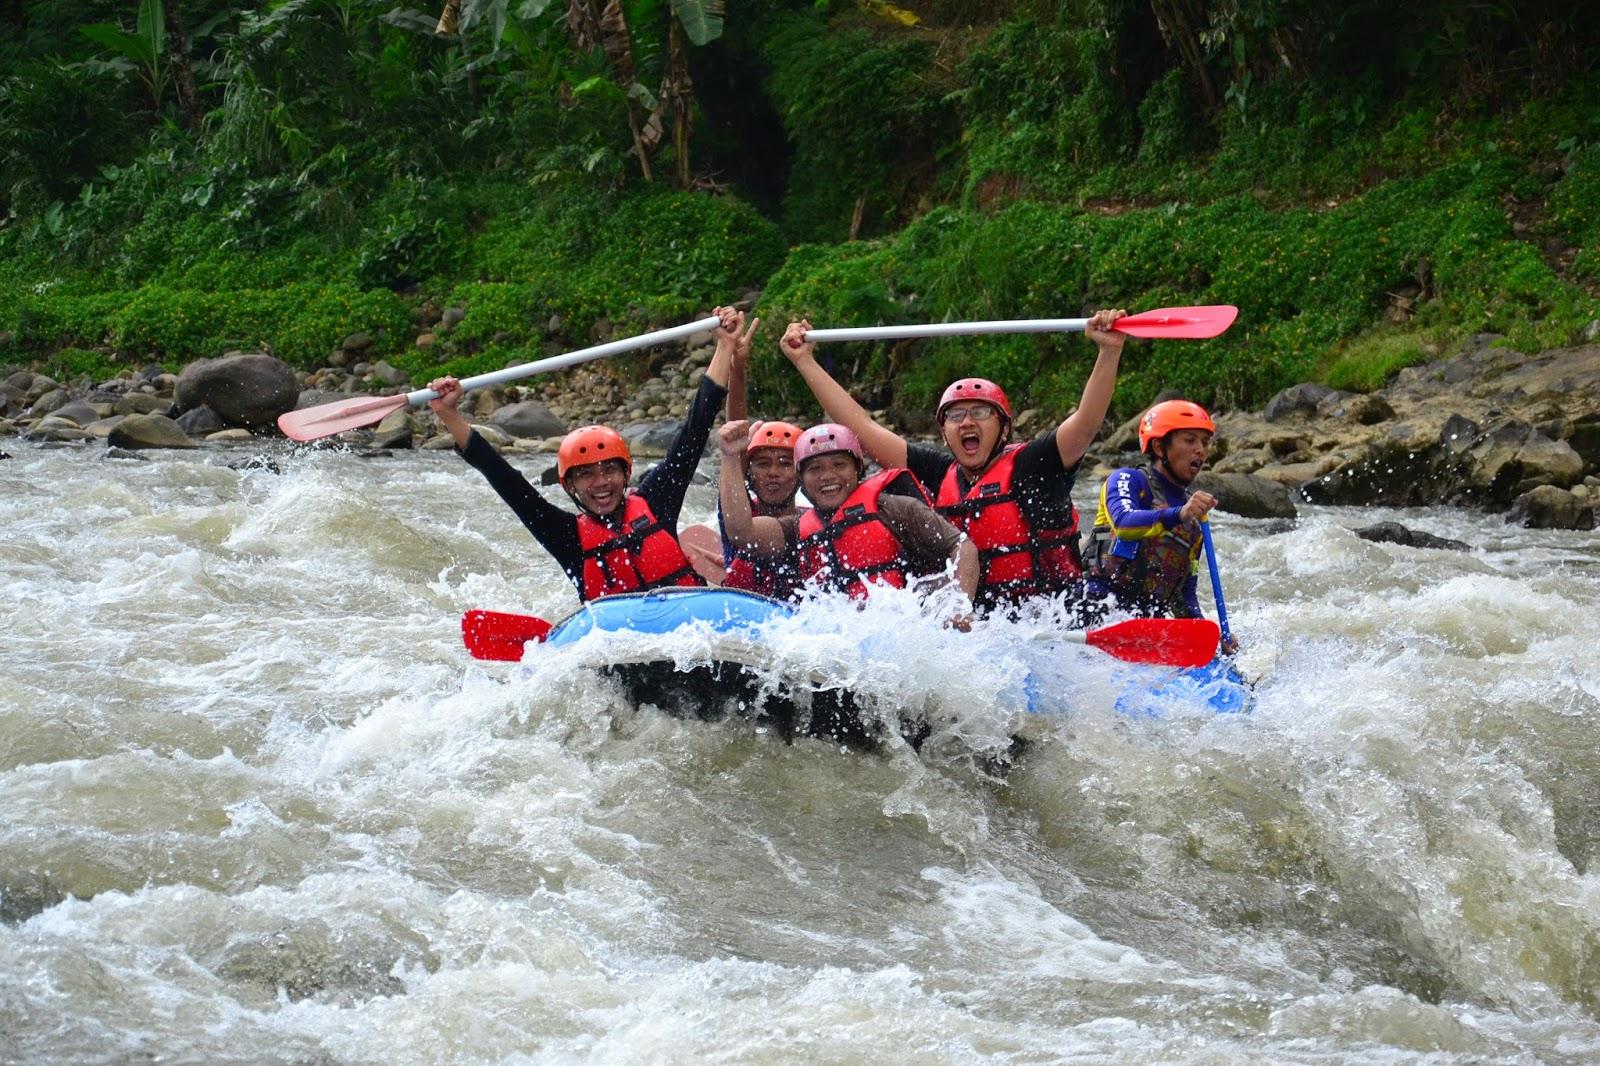 Wisata Arung Jeram Serayu Banjarnegara Menguji Adrenalin Kota Tersebut Terdapat